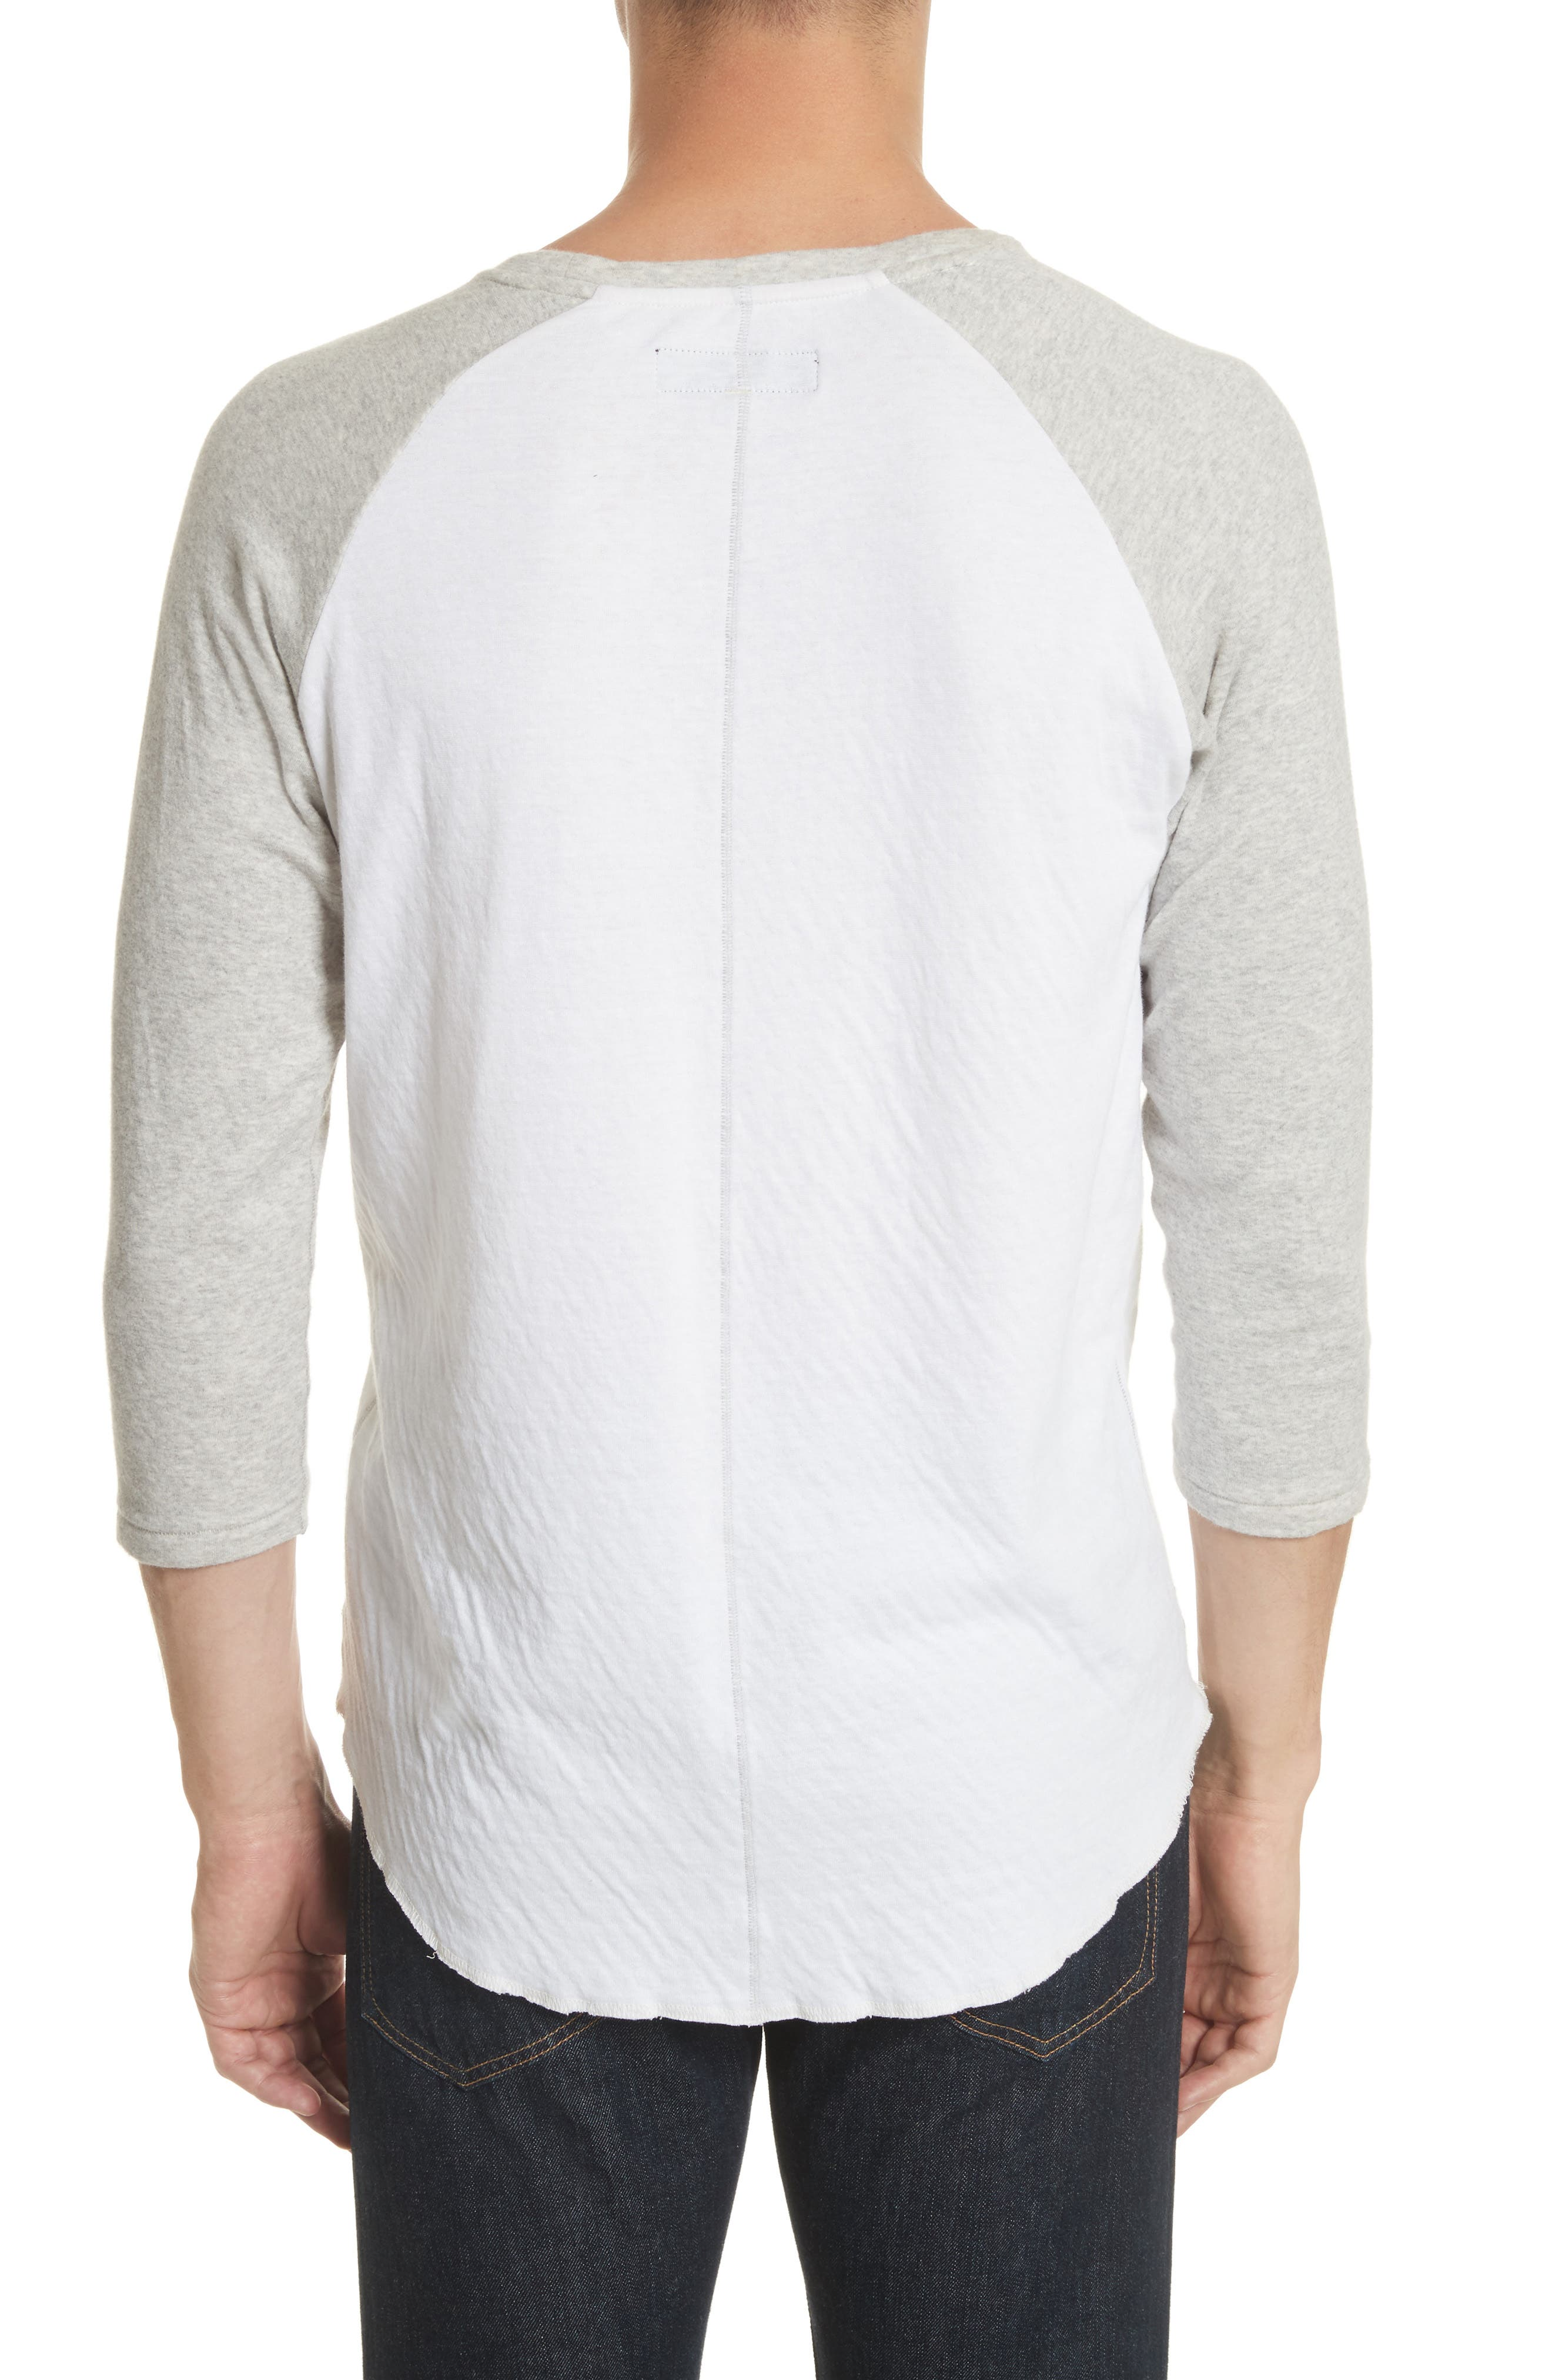 Rigby Baseball T-Shirt,                             Alternate thumbnail 2, color,                             Grey/ White